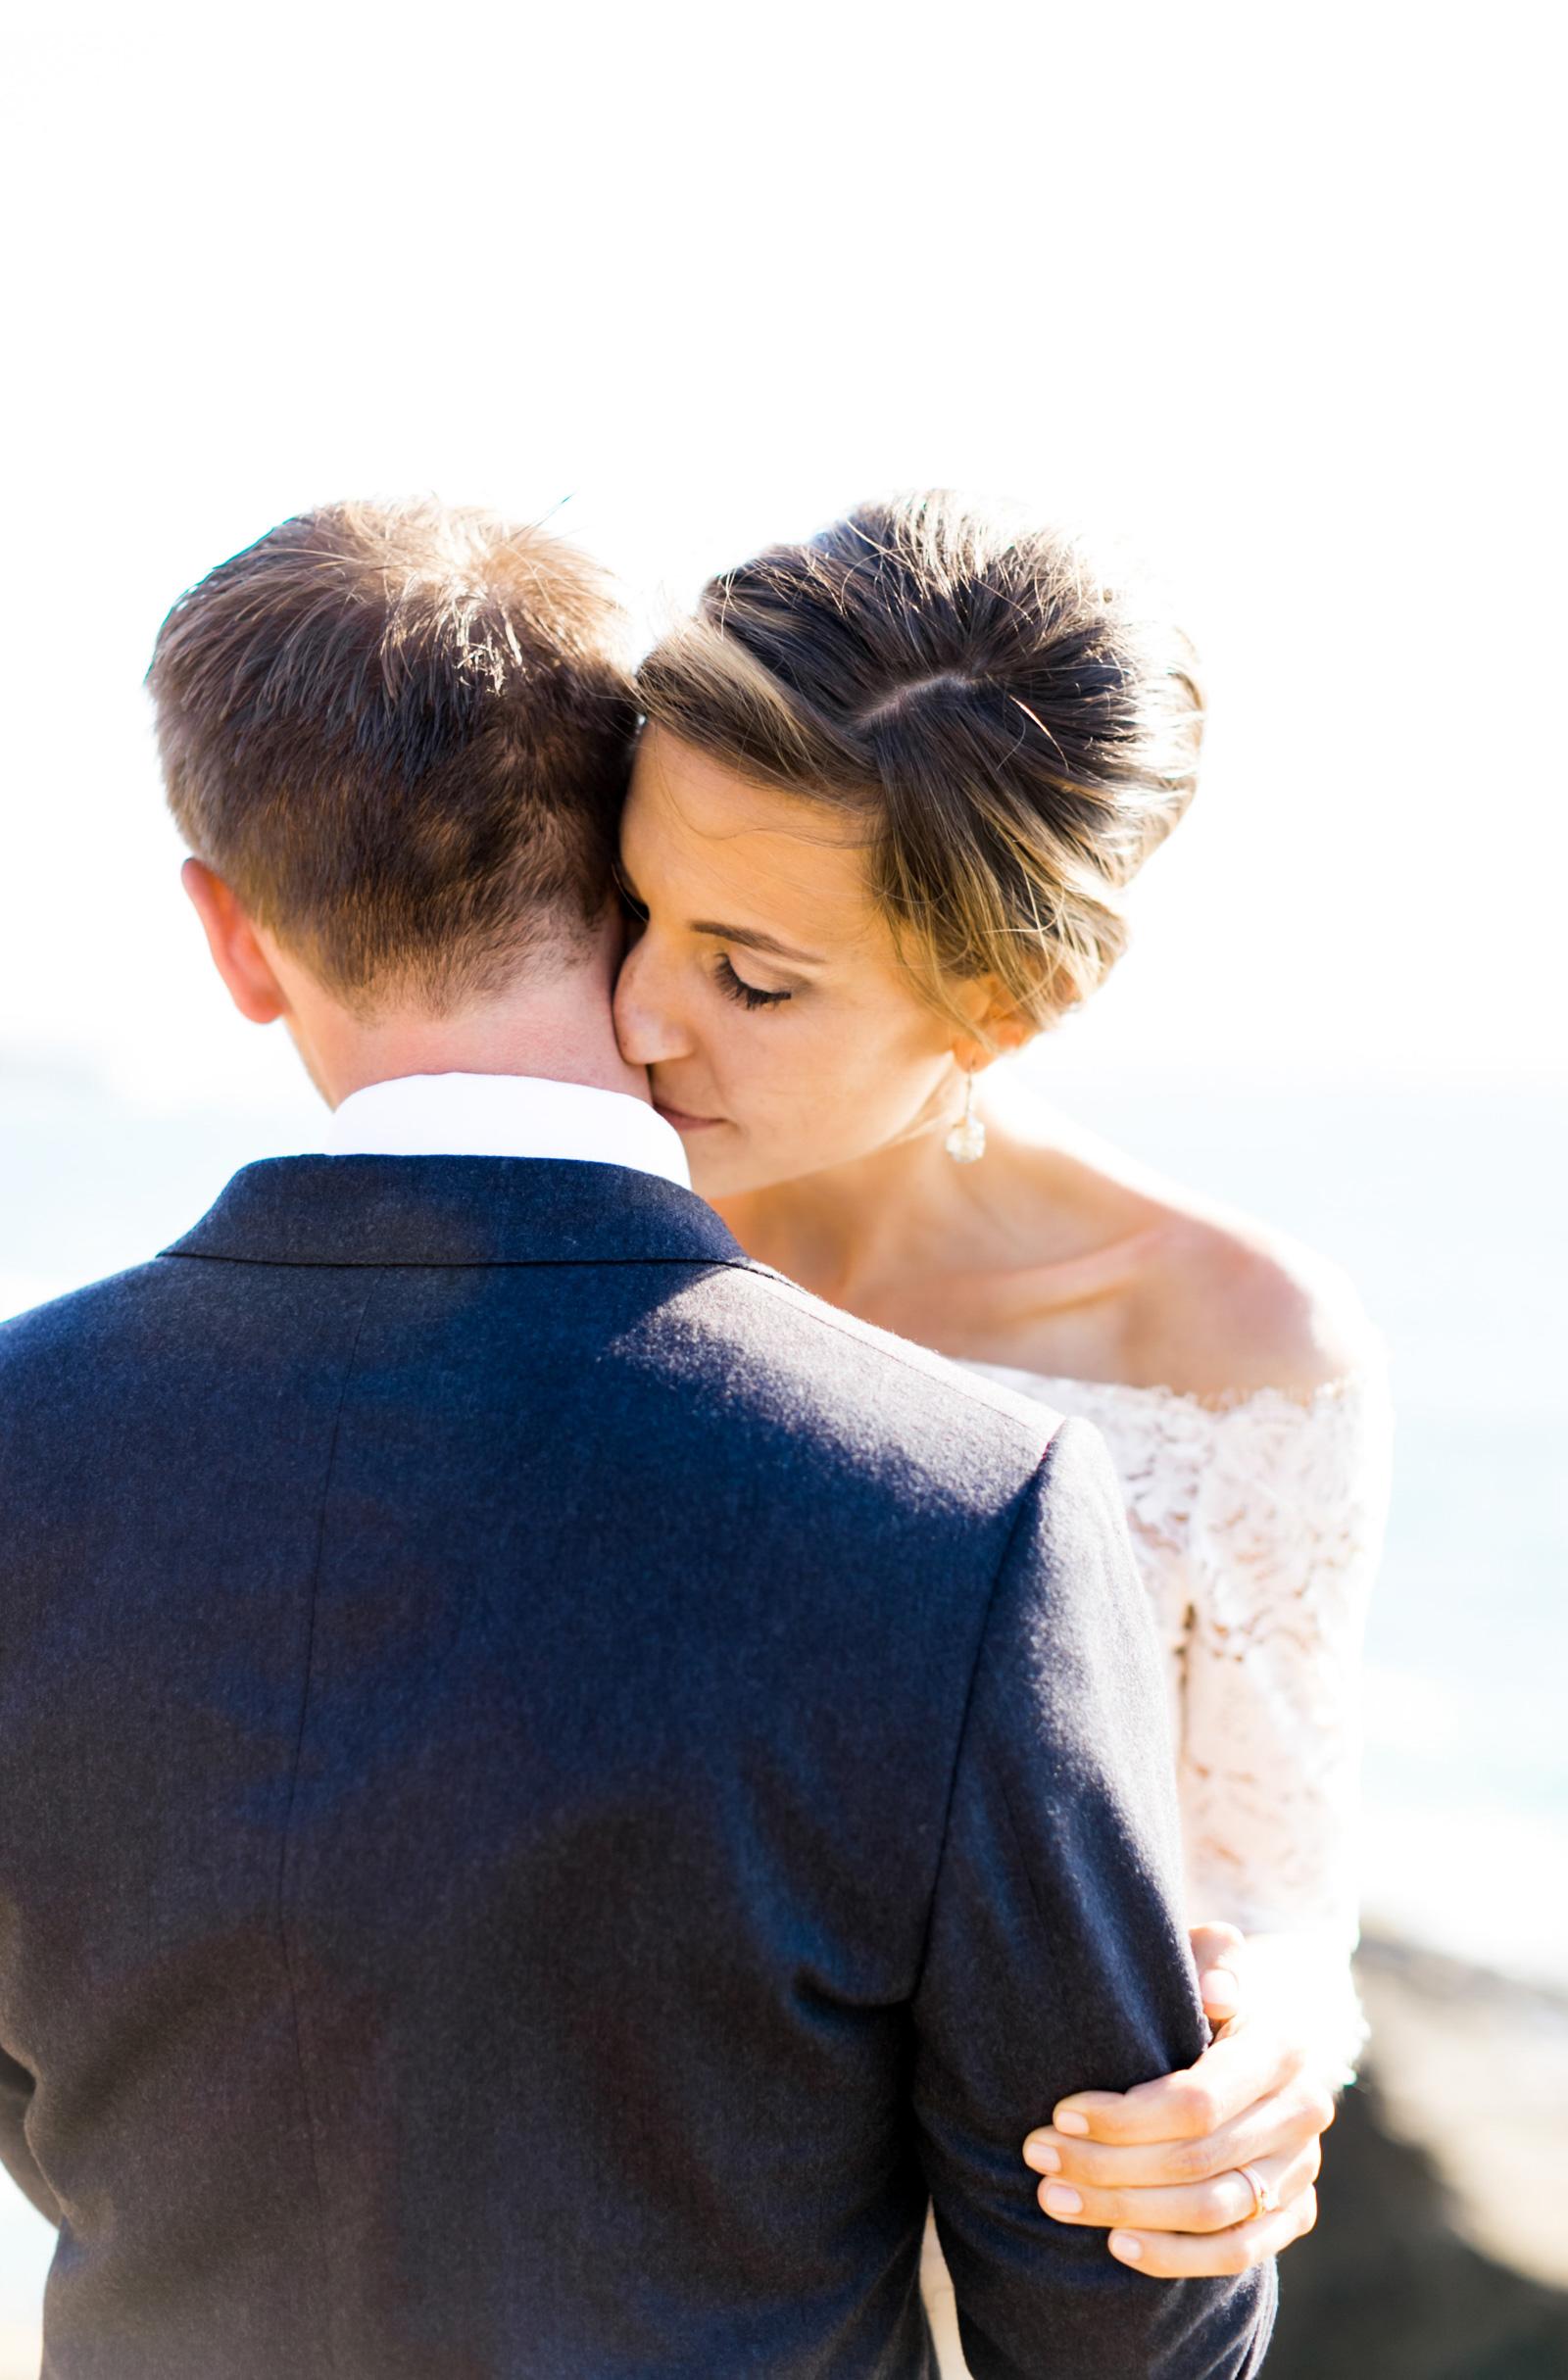 Style-Me-Pretty-Mendocino-Wedding-Natalie-Schutt-Photography_03.jpg